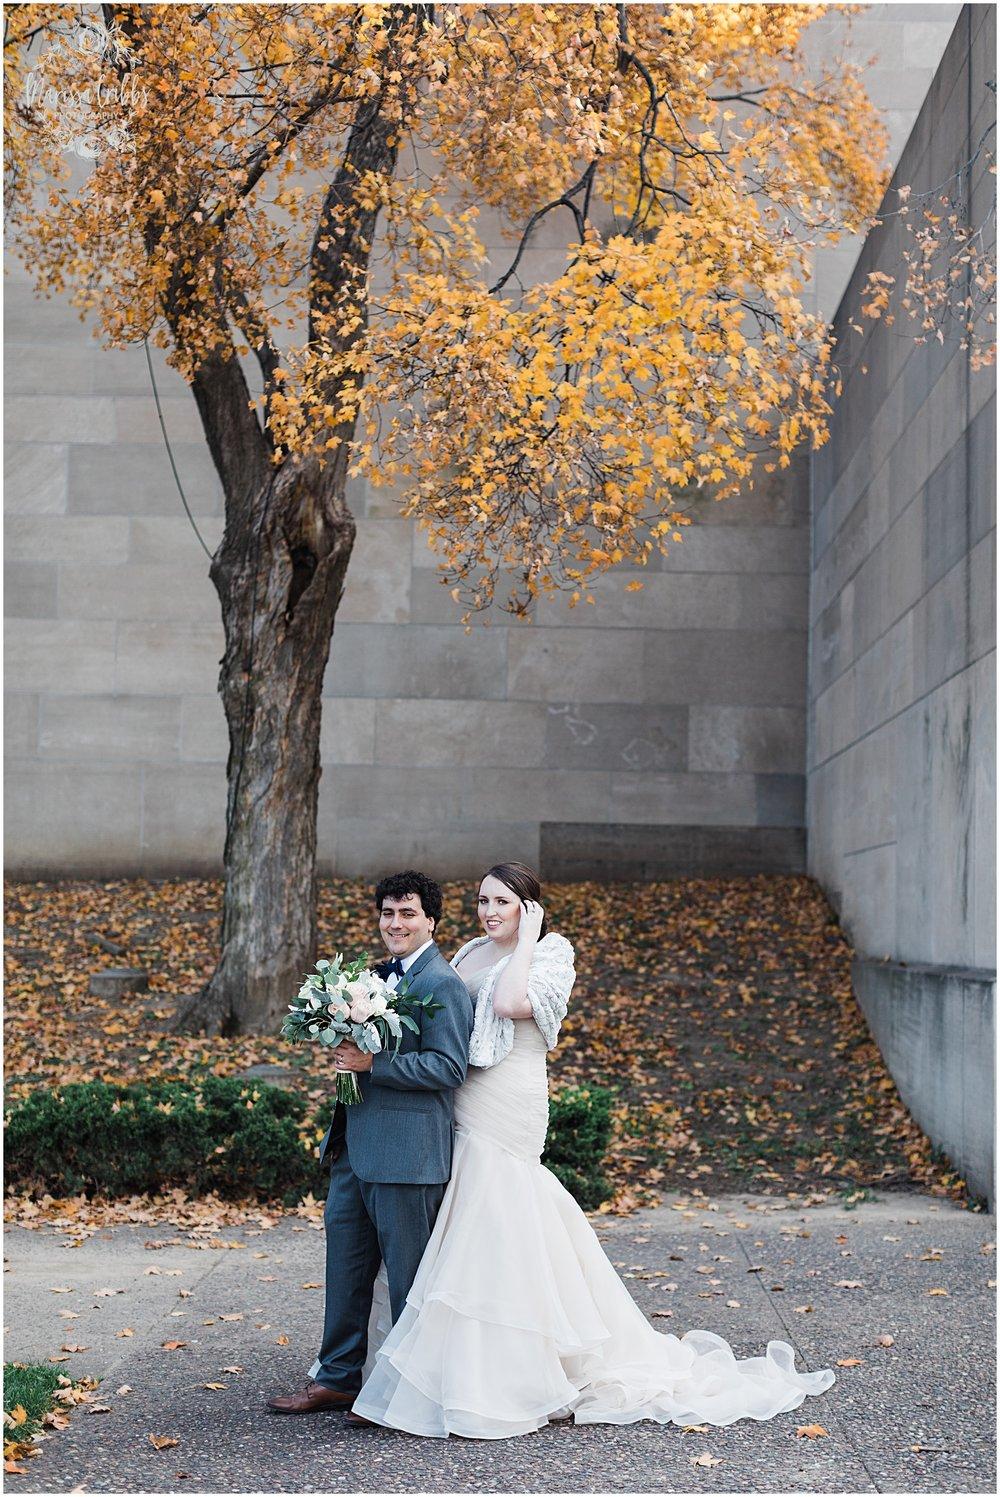 JULIA & AUSTIN MADRID THEATRE WEDDING | MARISSA CRIBBS PHOTOGRAPHY_7112.jpg